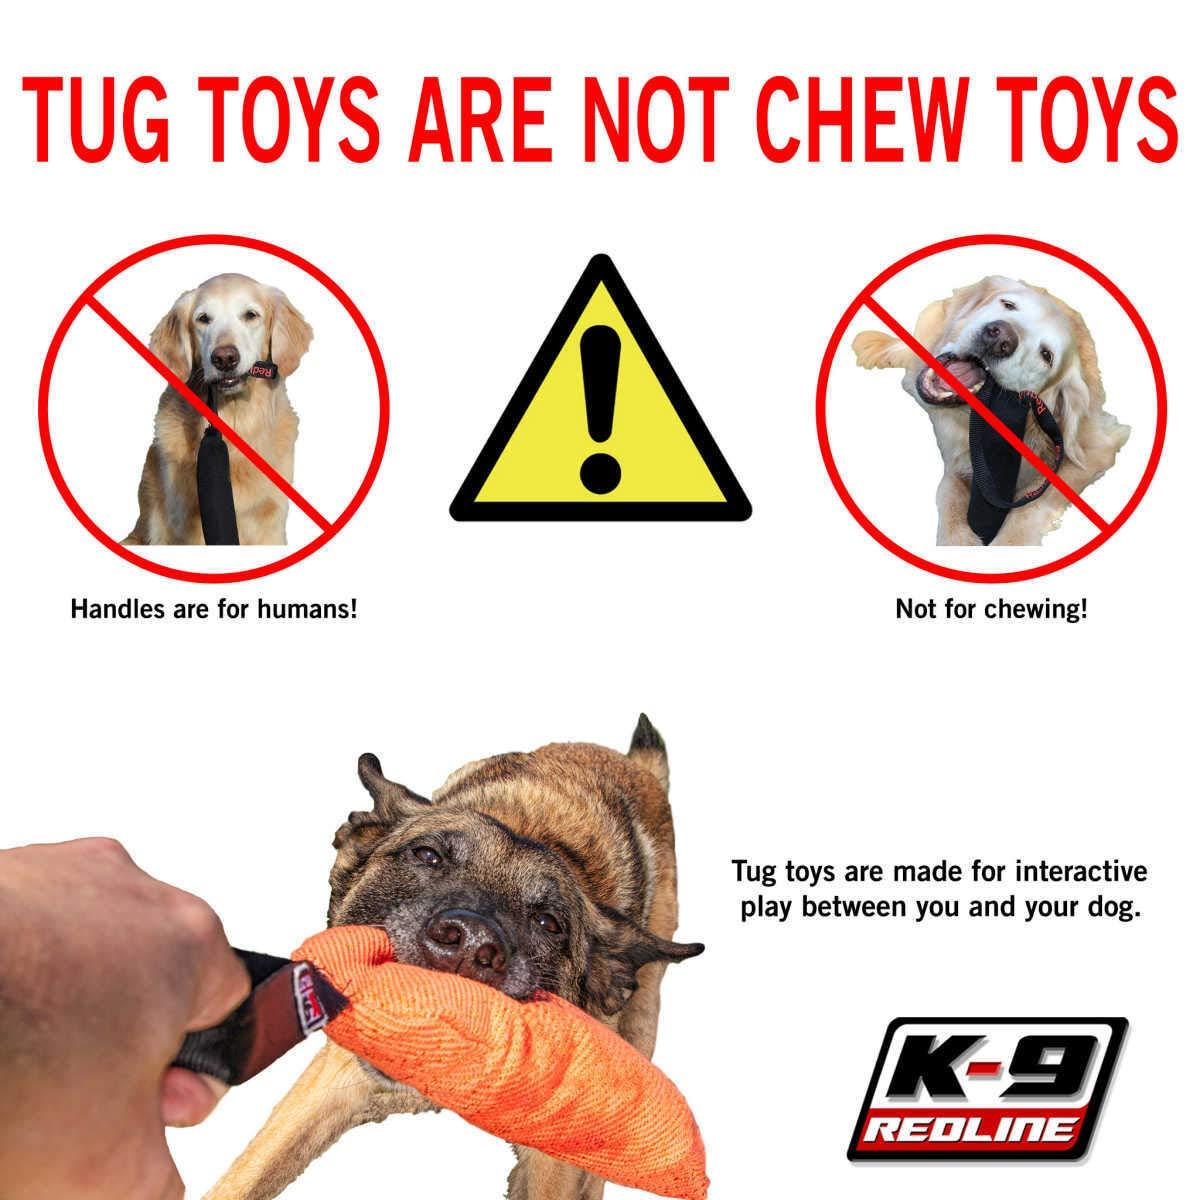 Jute Tug Toy 1.5 x 10 1 handle RedLine K9